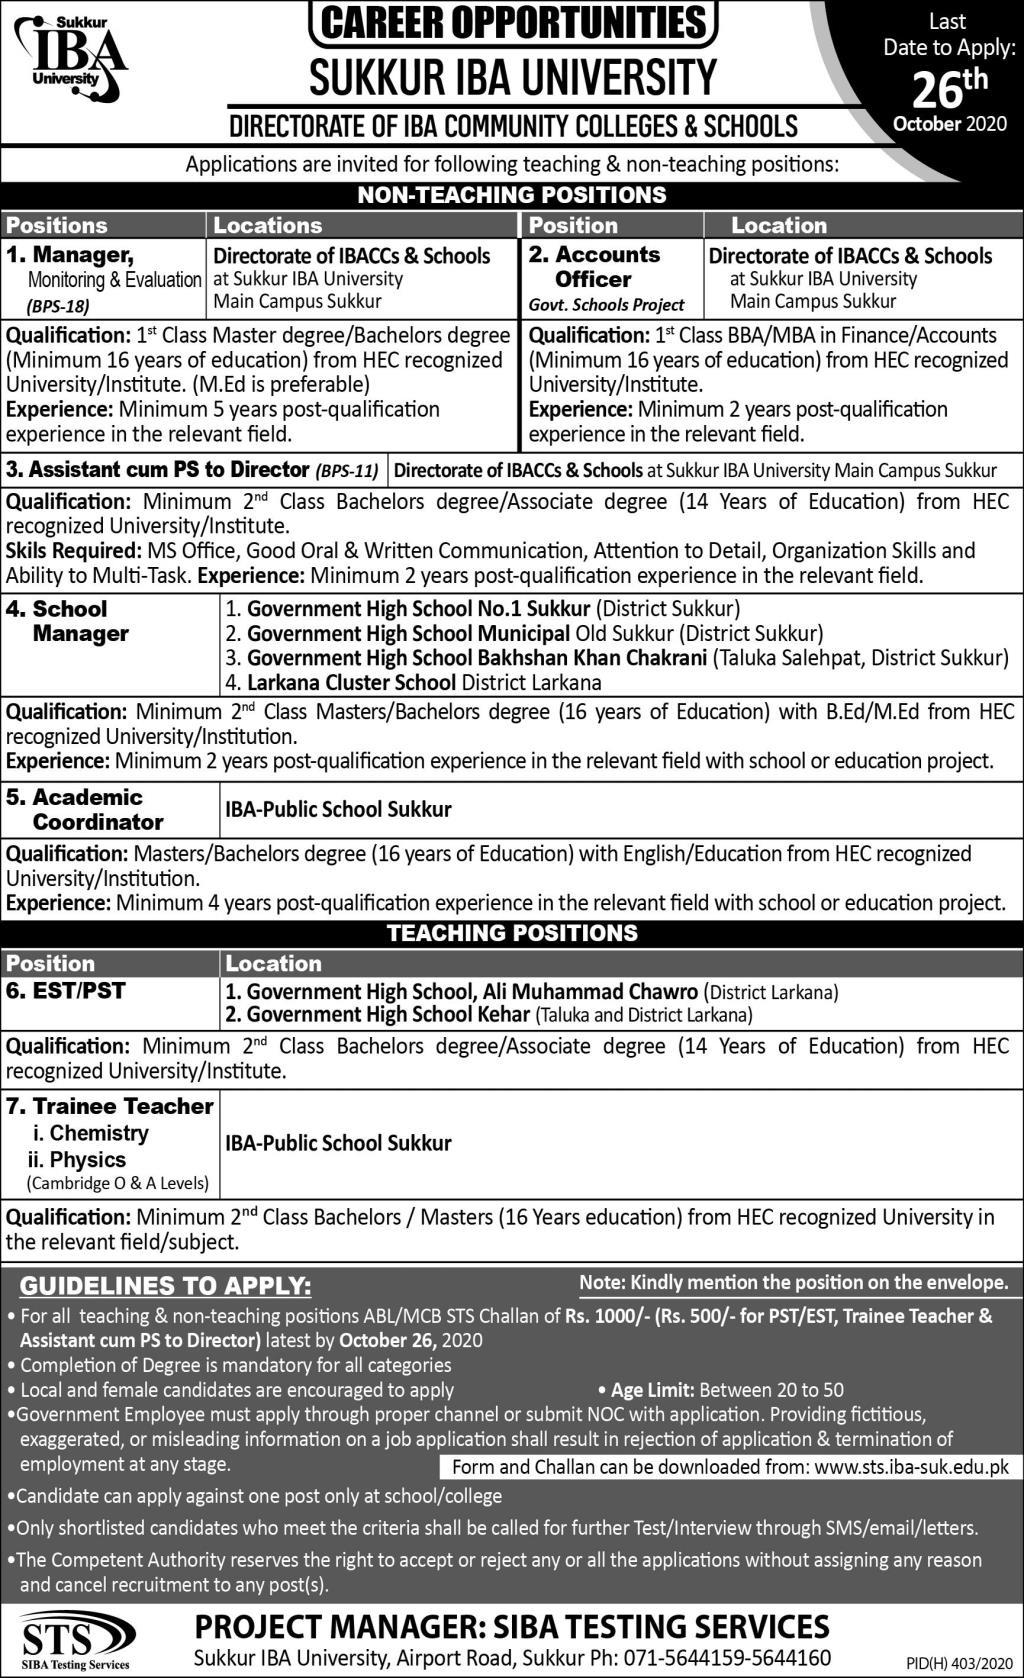 Sukkur IBA University Jobs October 2020